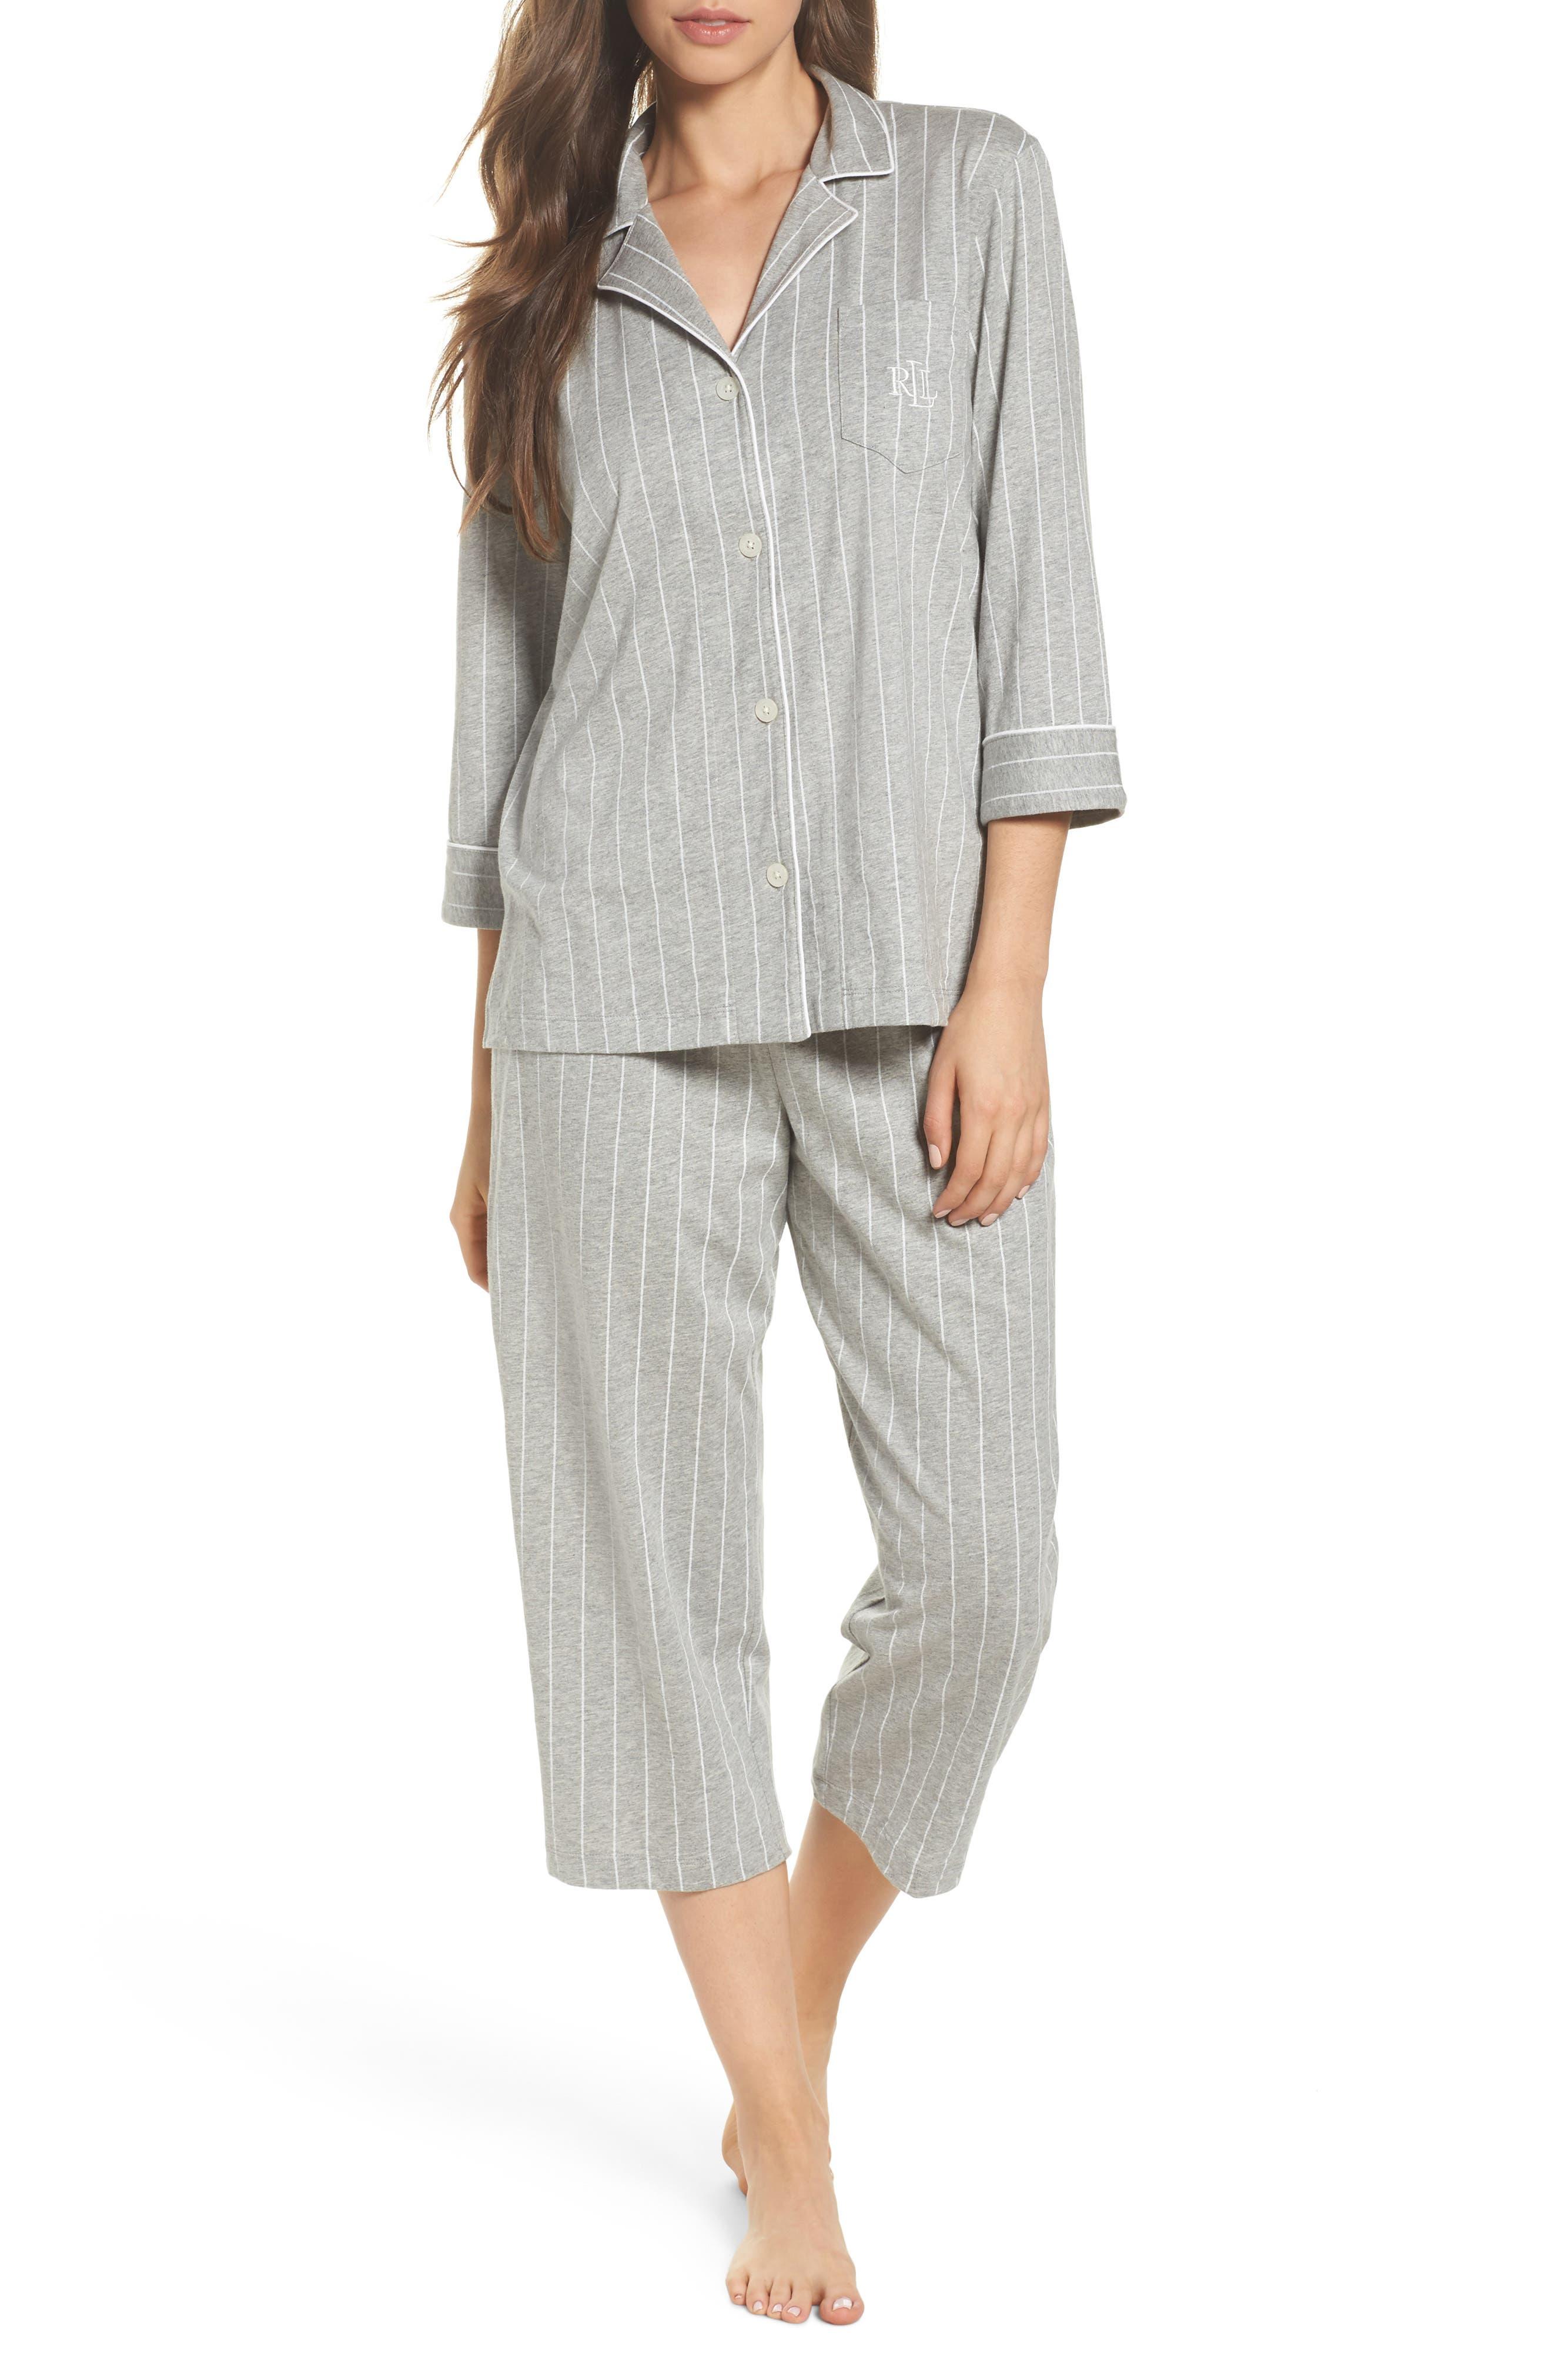 LAUREN RALPH LAUREN, Knit Crop Pajamas, Main thumbnail 1, color, GREYSTONE